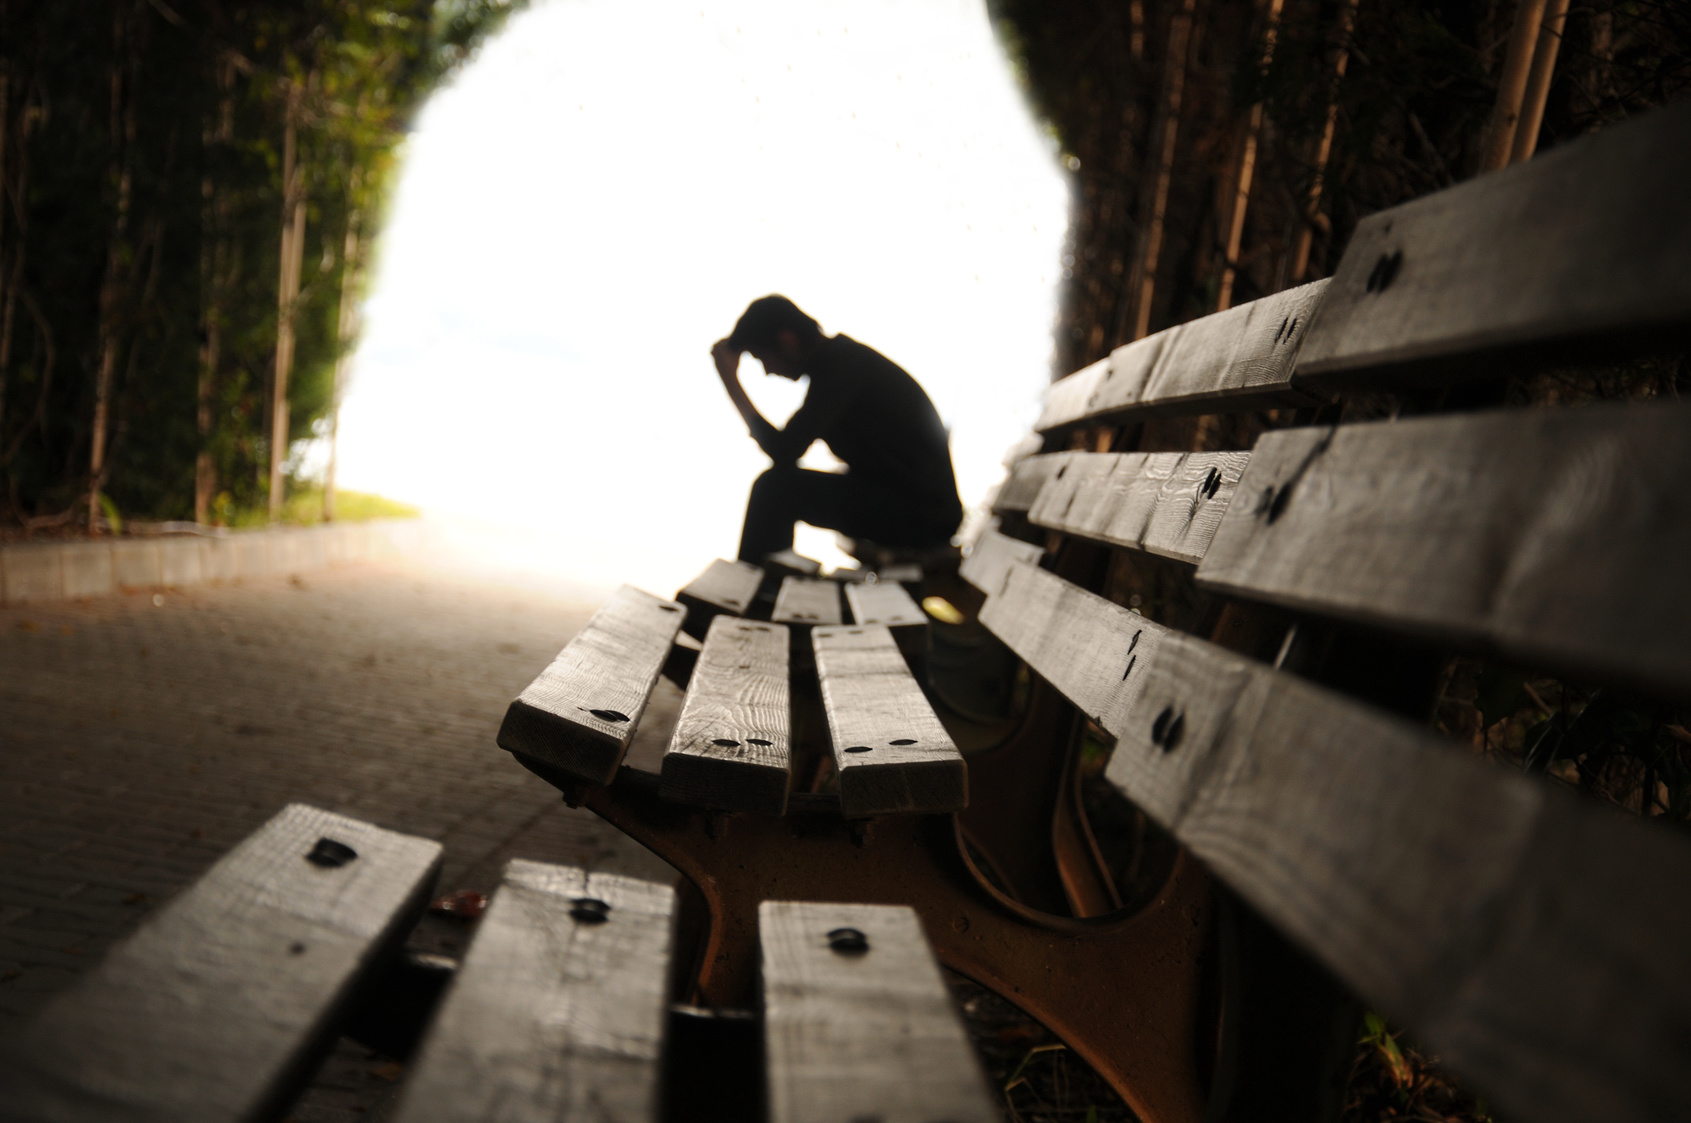 Vortrag: Antidepressiva - Segen oder Fluch!?